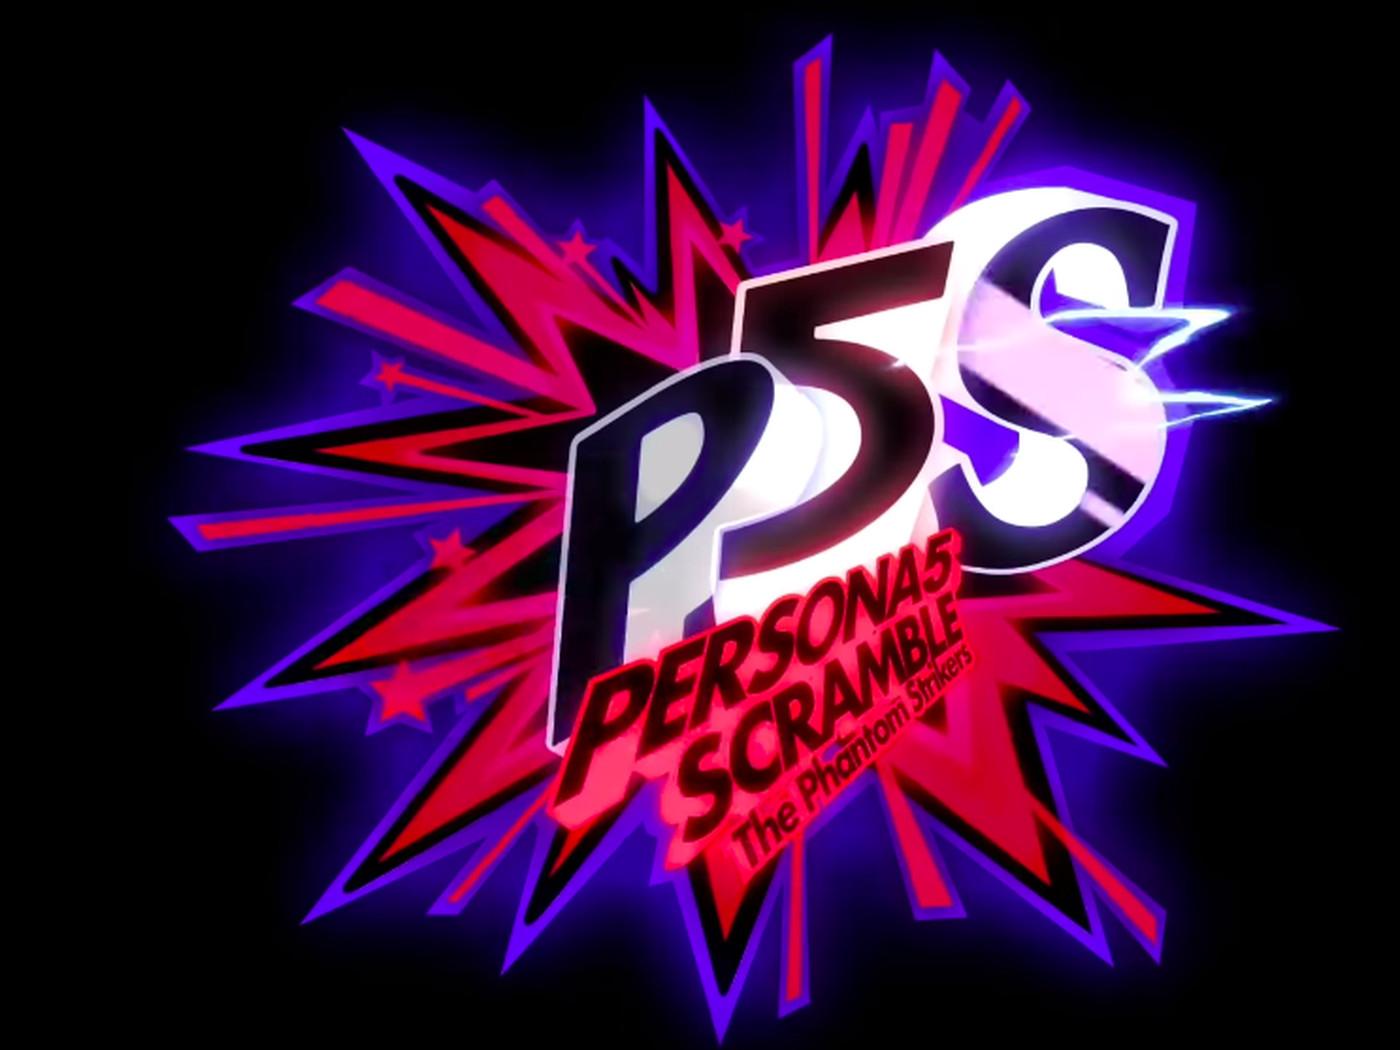 Persona 5 Scramble Is A True Sequel To Persona 5 The Verge